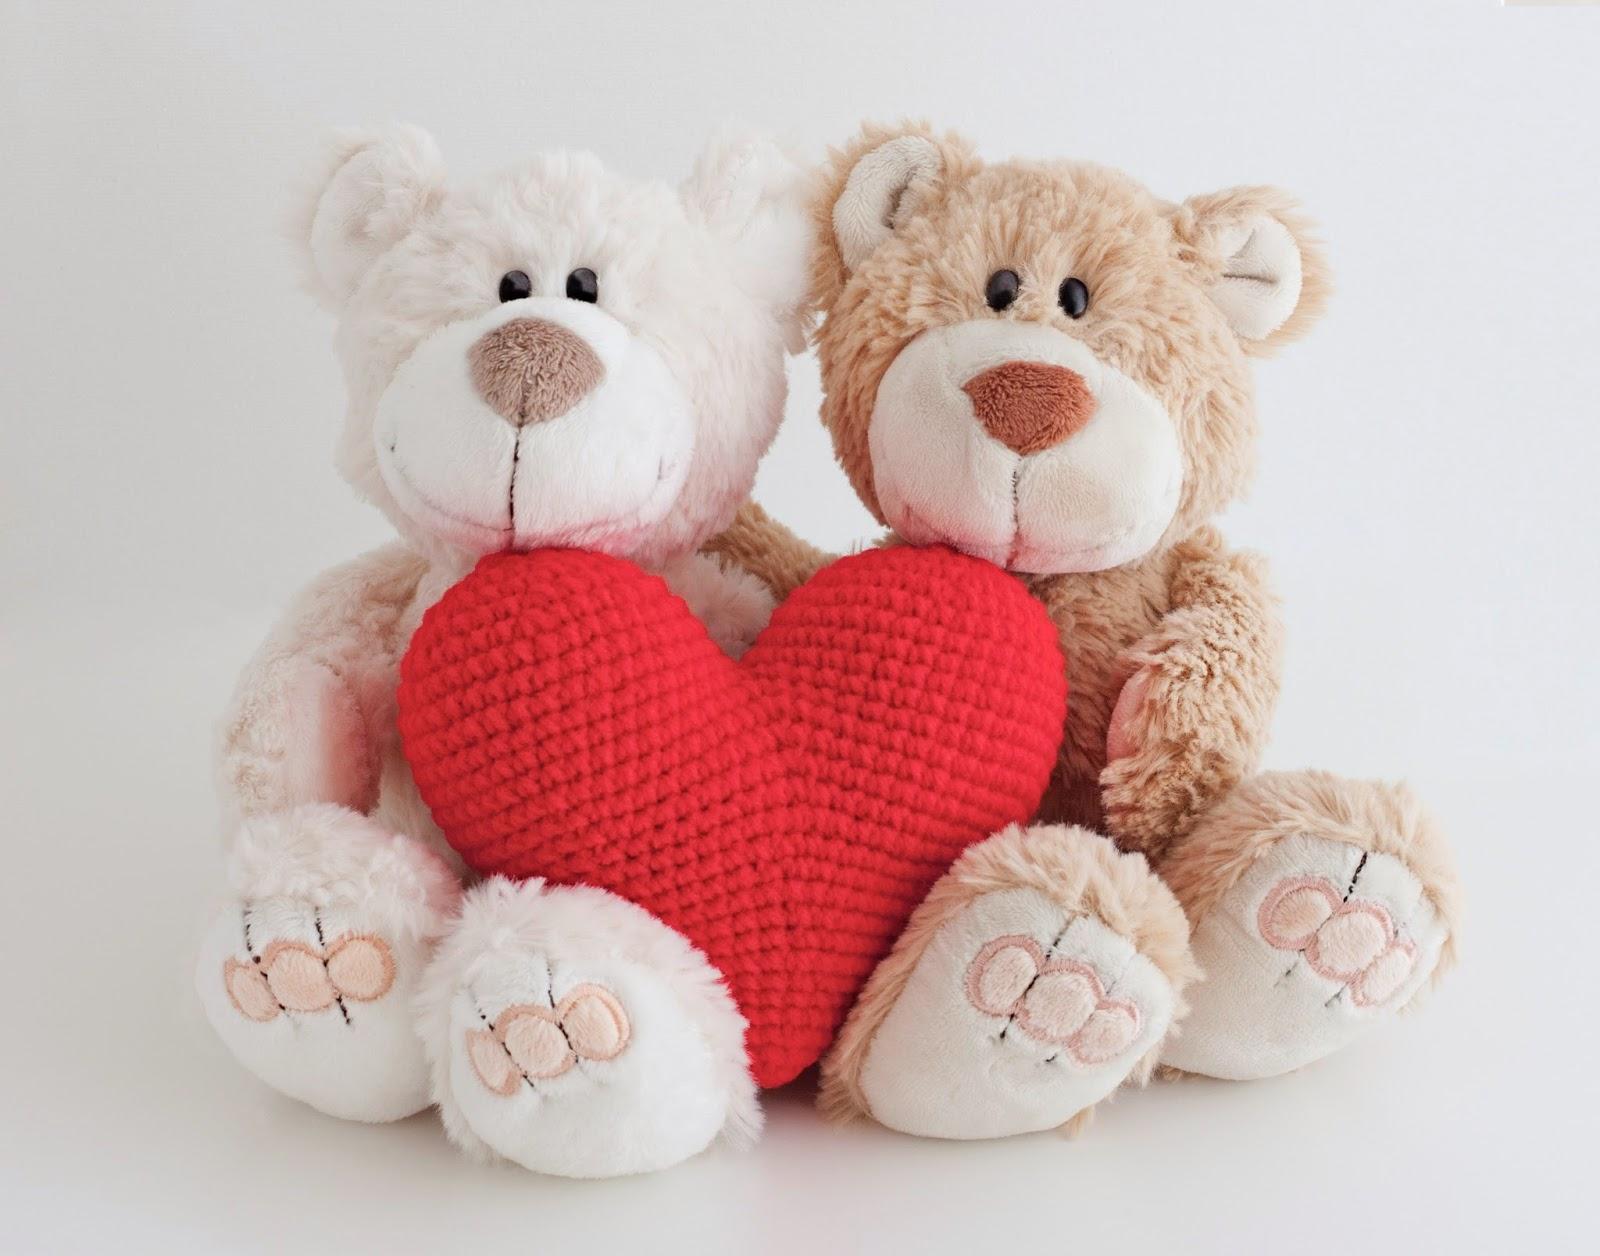 Amigurumi corazon heart